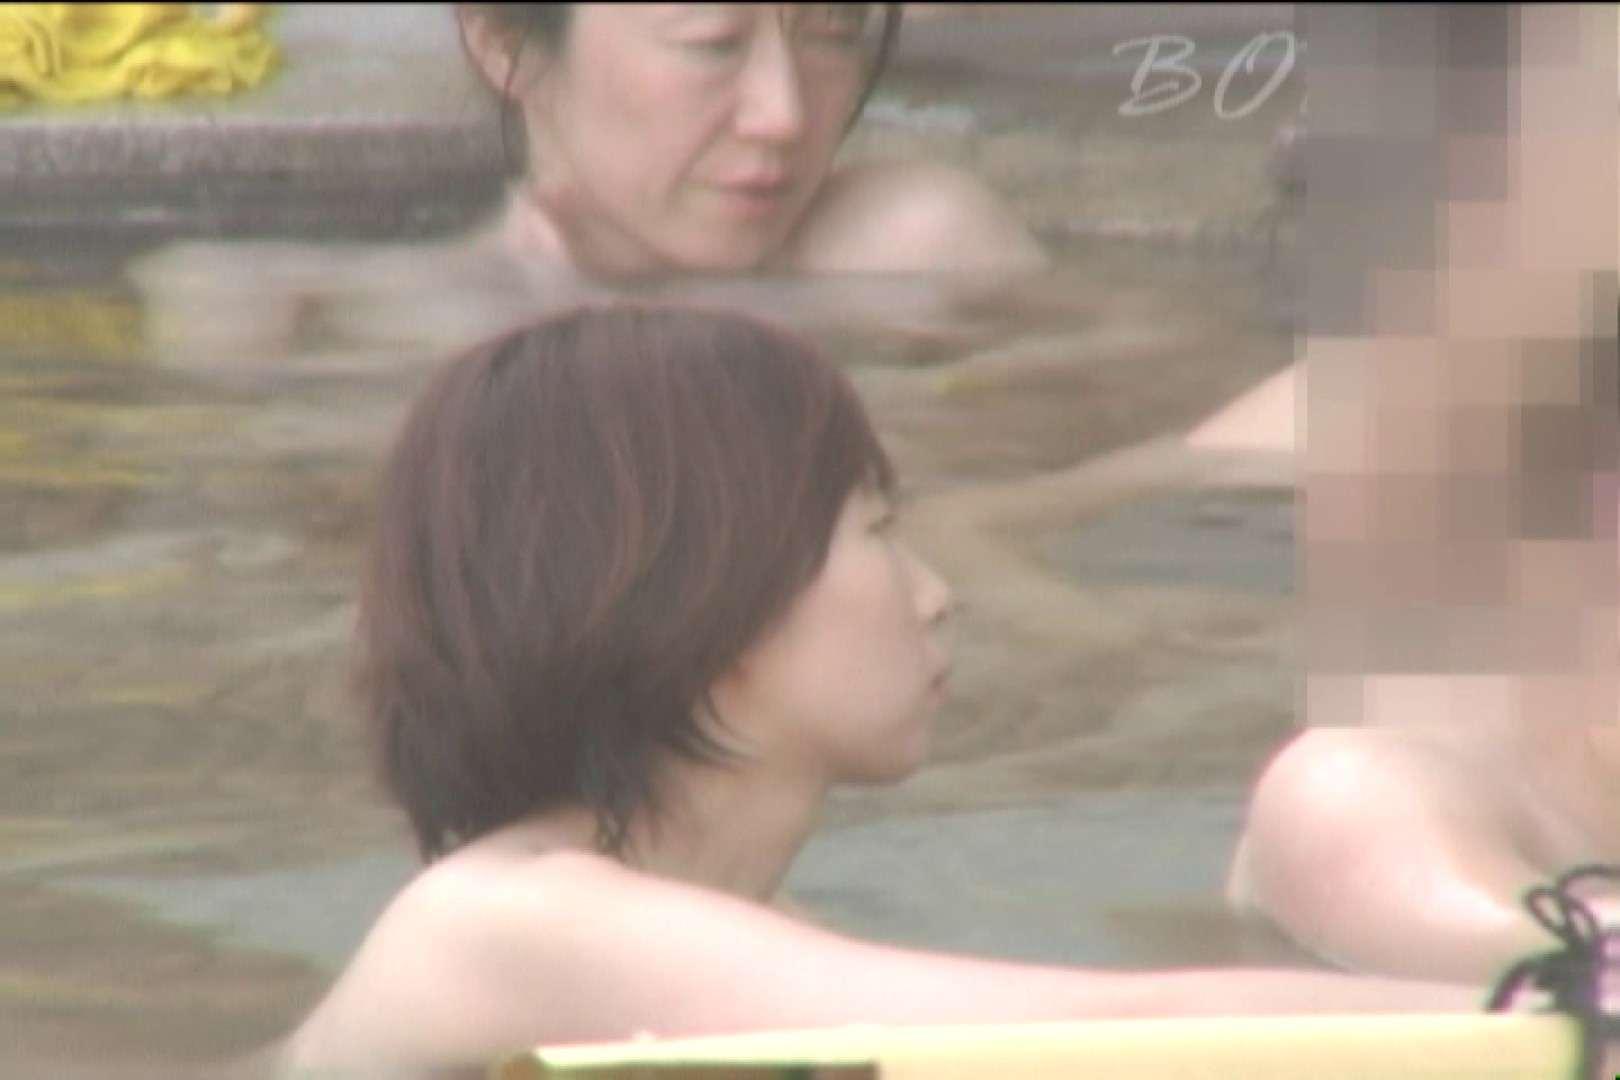 Aquaな露天風呂Vol.476 盗撮師作品 オマンコ無修正動画無料 85pic 68